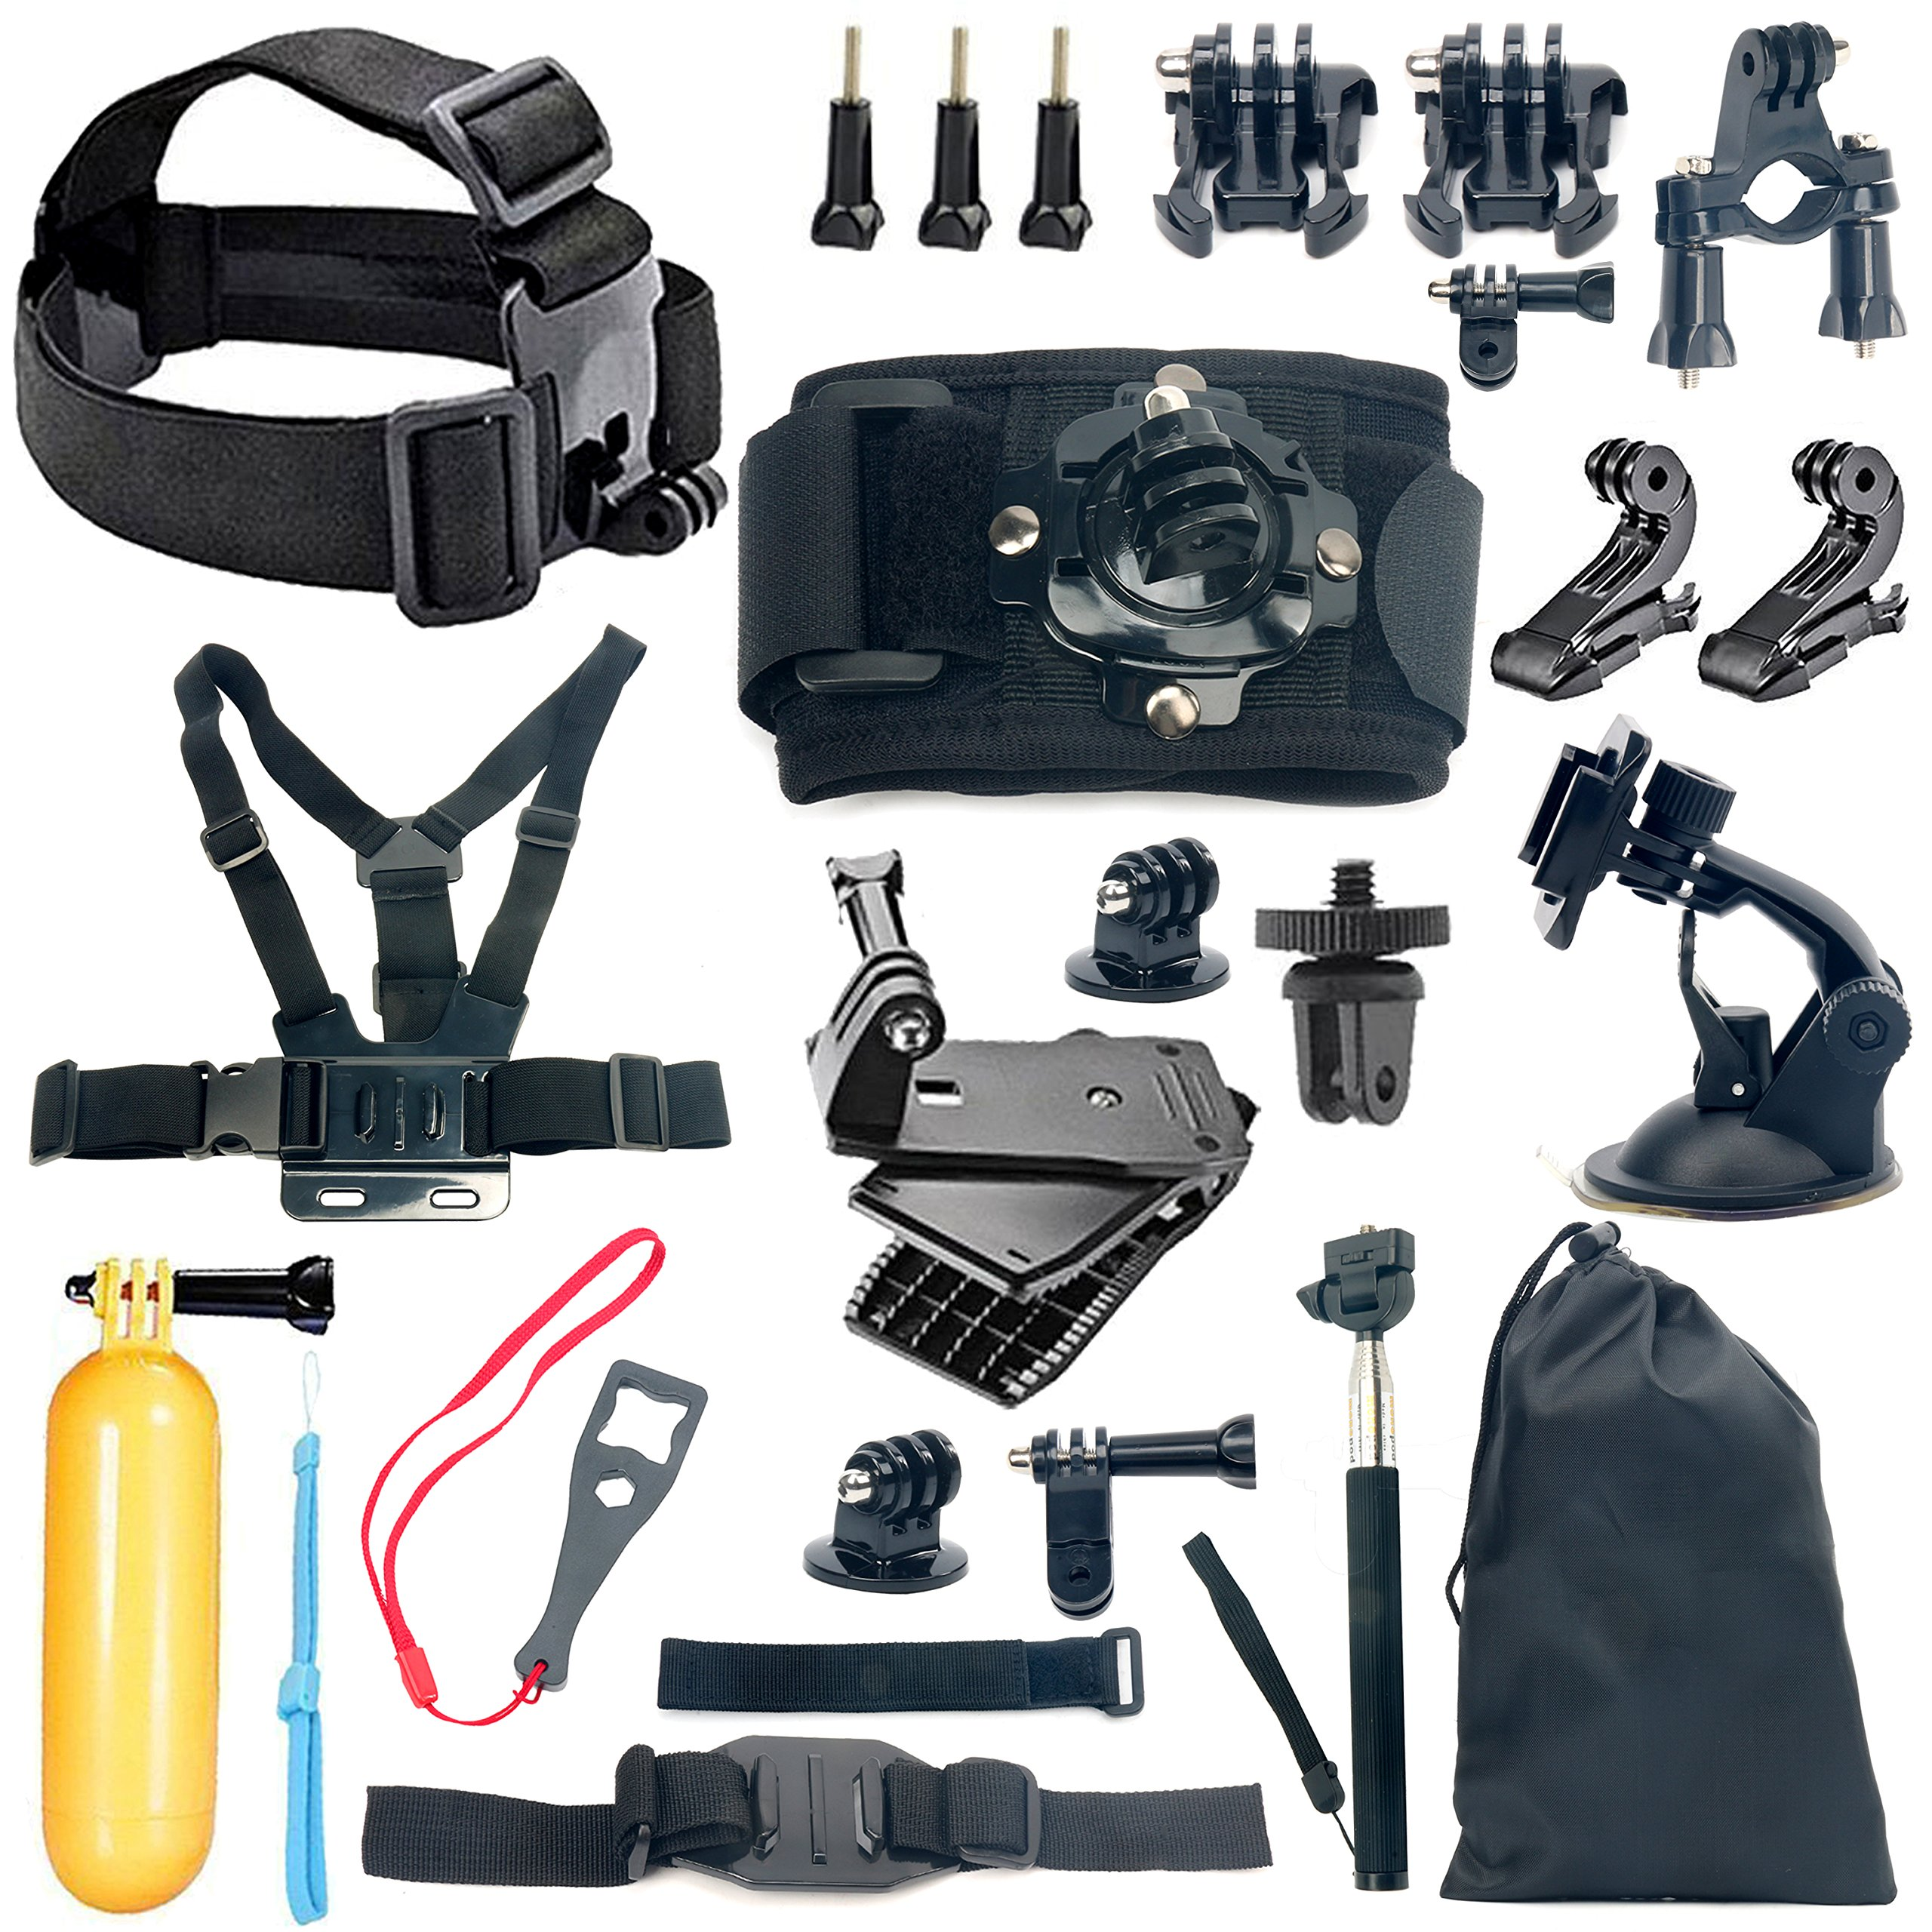 YaeCCC 18-in-1 Gopro Accessory Kit for GoPro Hero5 Black, Hero5 Session, Hero 4 Silver Black, Hero Session, Hero3+,3,2,1 SJ4000,5000,6000,XIAOMIYI,2,Sports Camera Accessories,Gopro Bundle